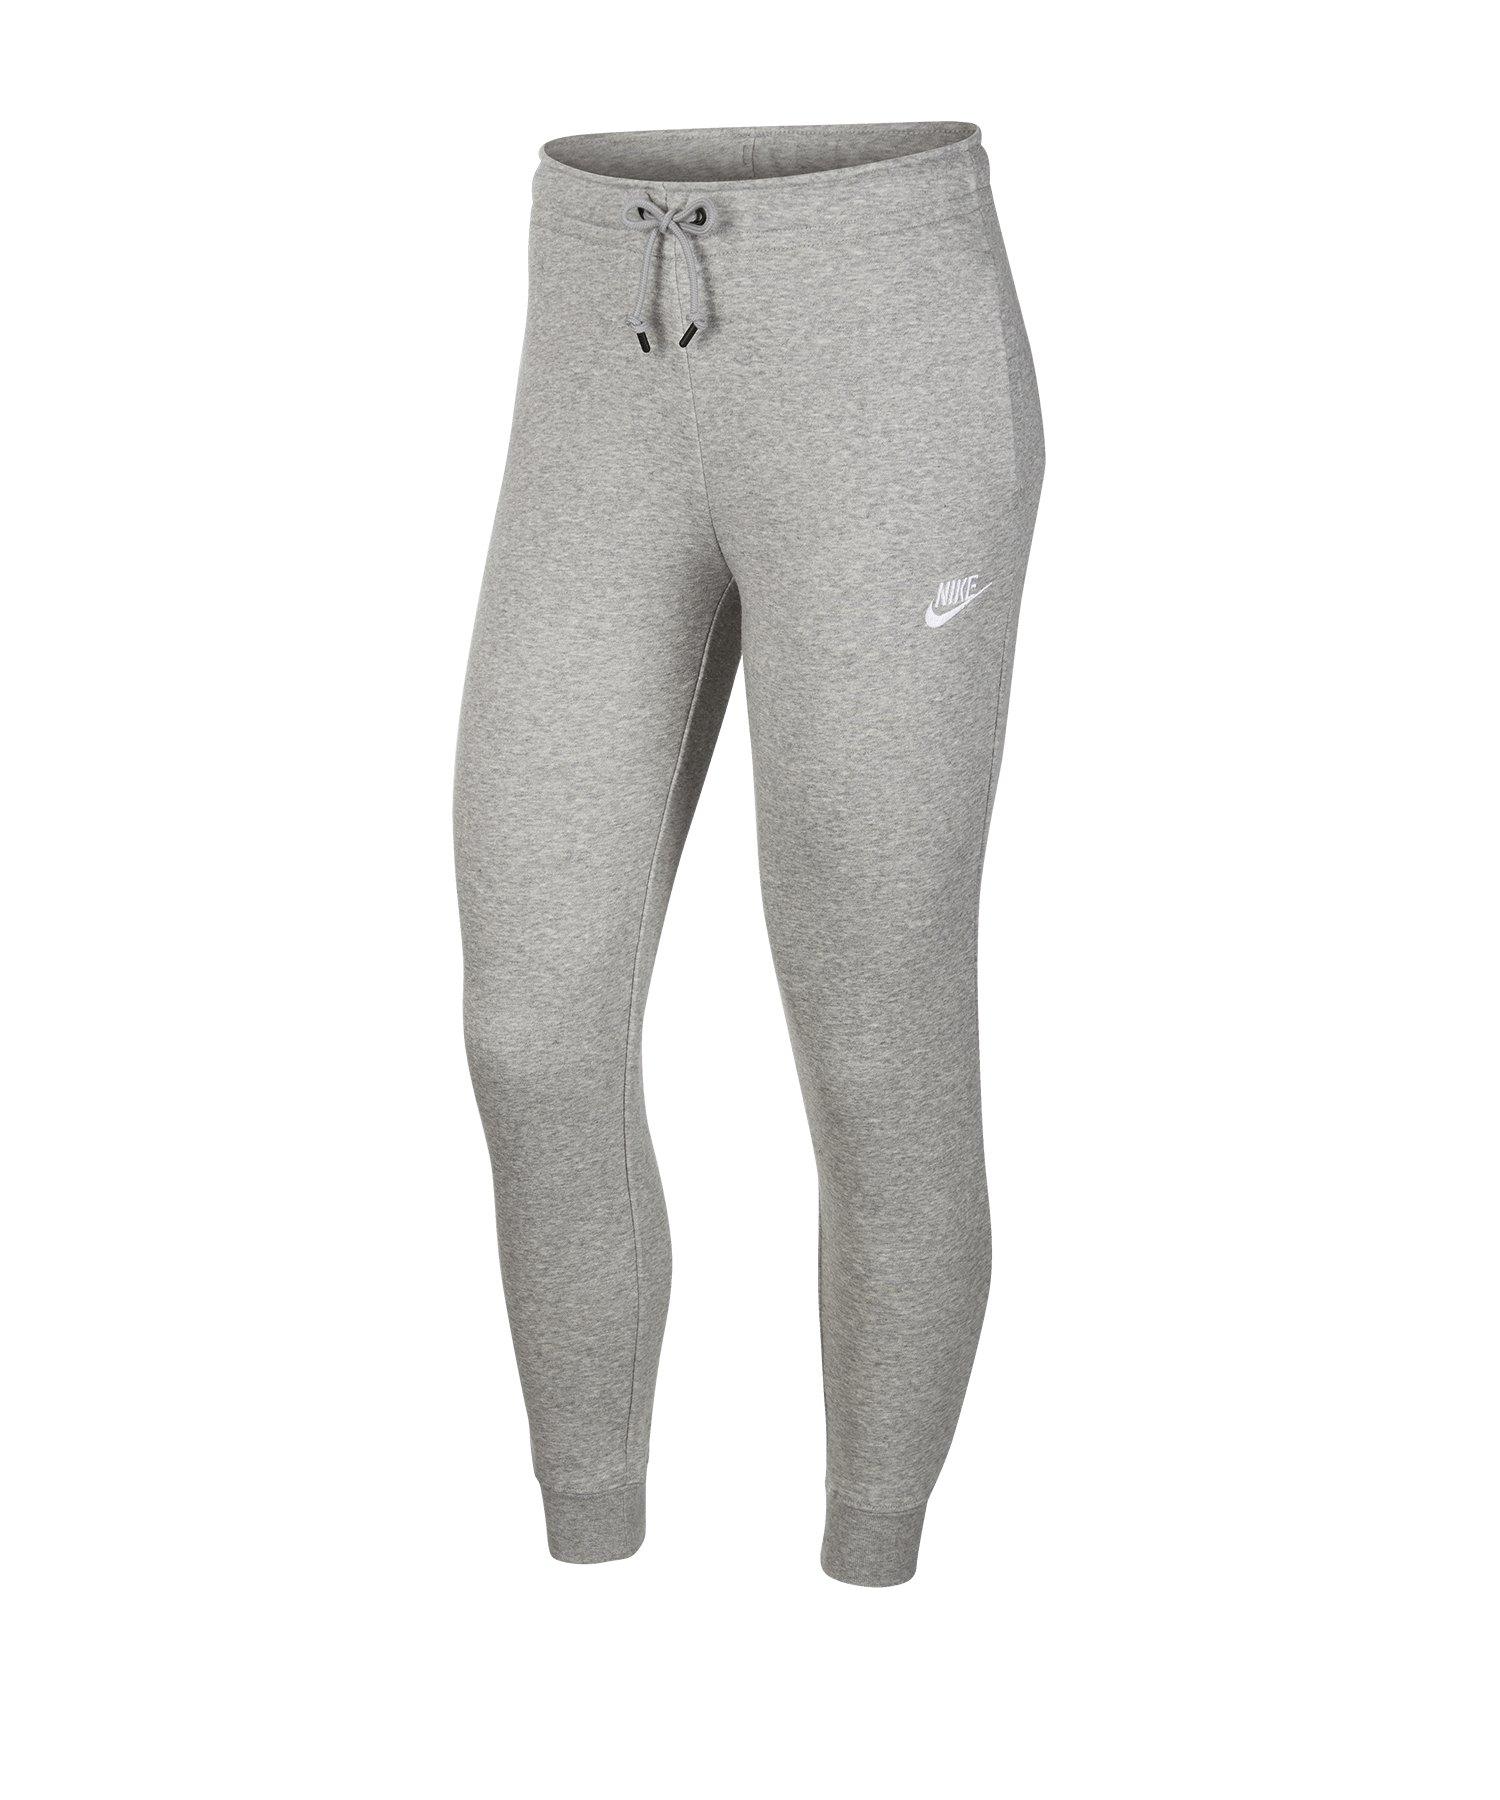 Nike Essential Fleece Jogginghose Damen Grau F063 - grau